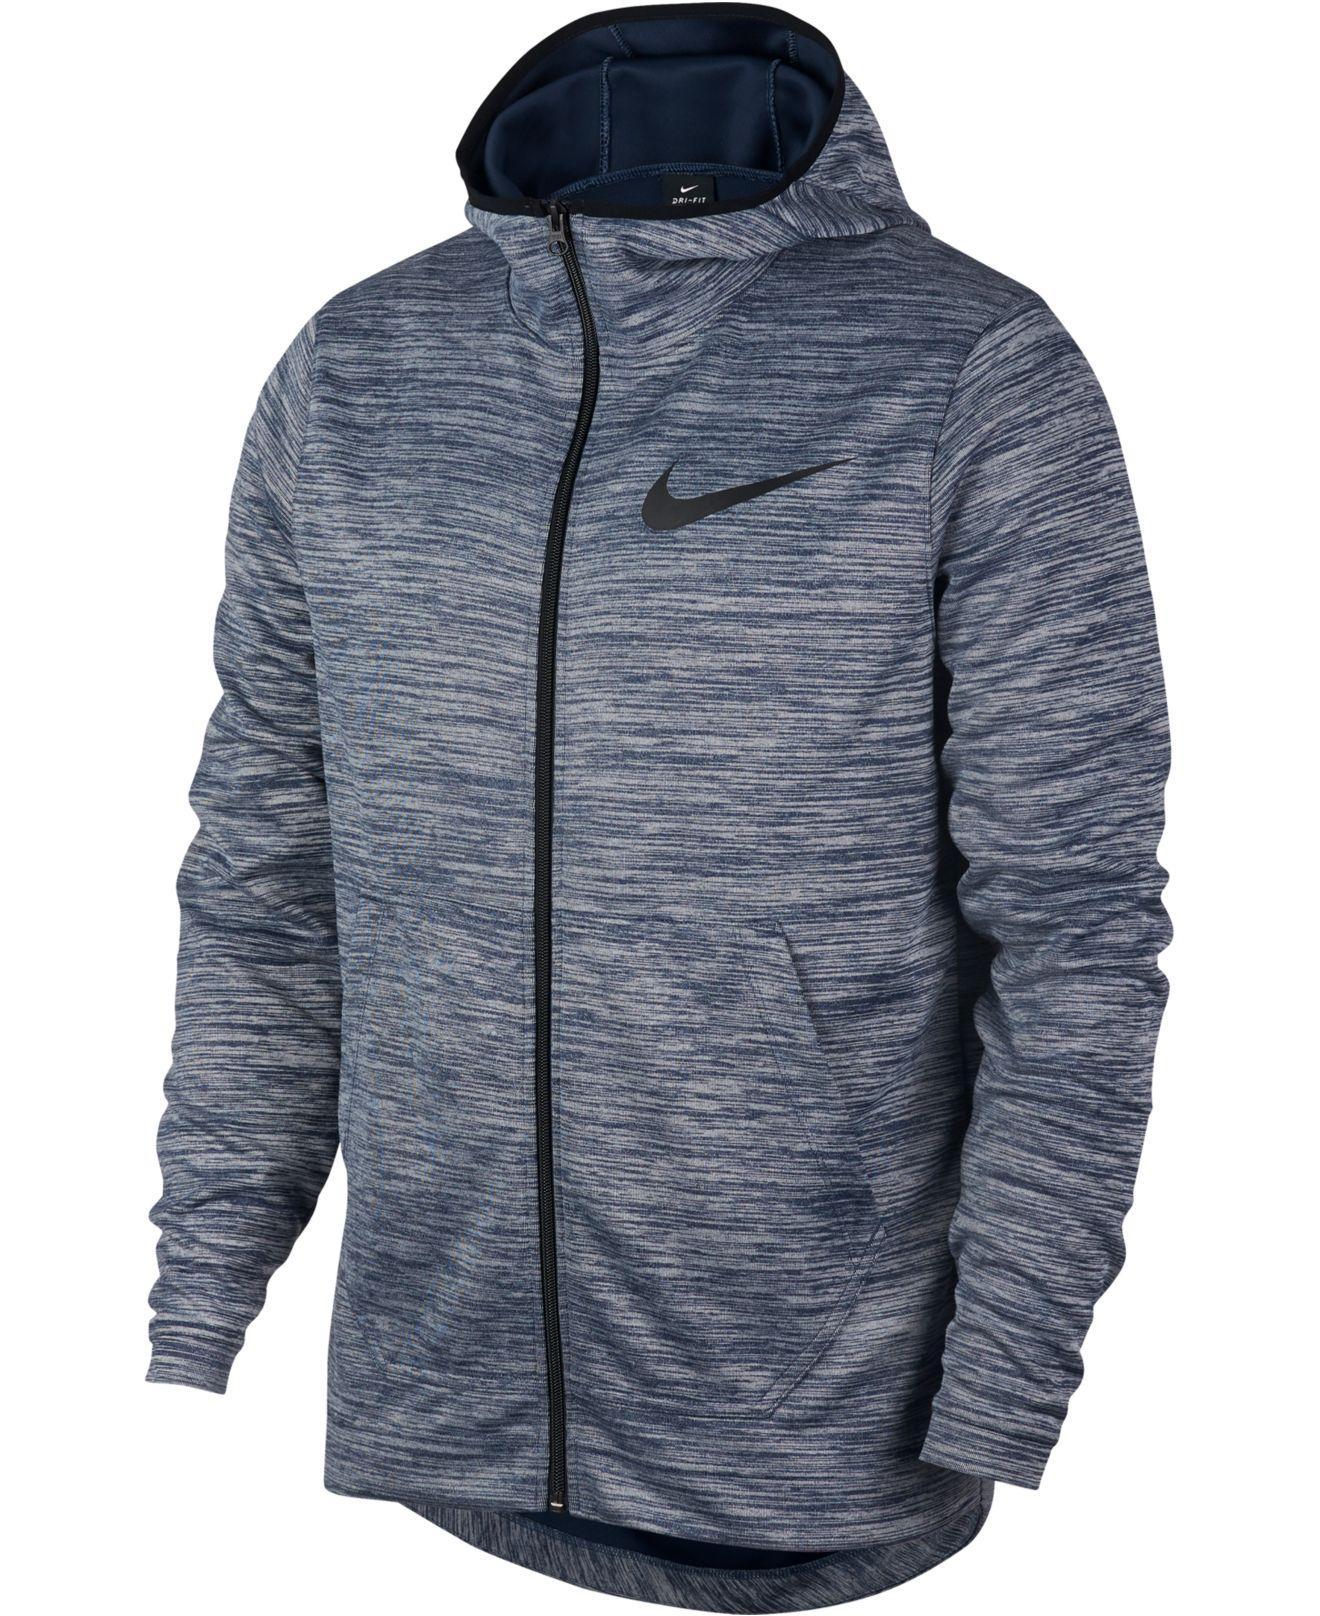 da665446 Nike Spotlight Dri-fit Zip Hoodie in Blue for Men - Lyst